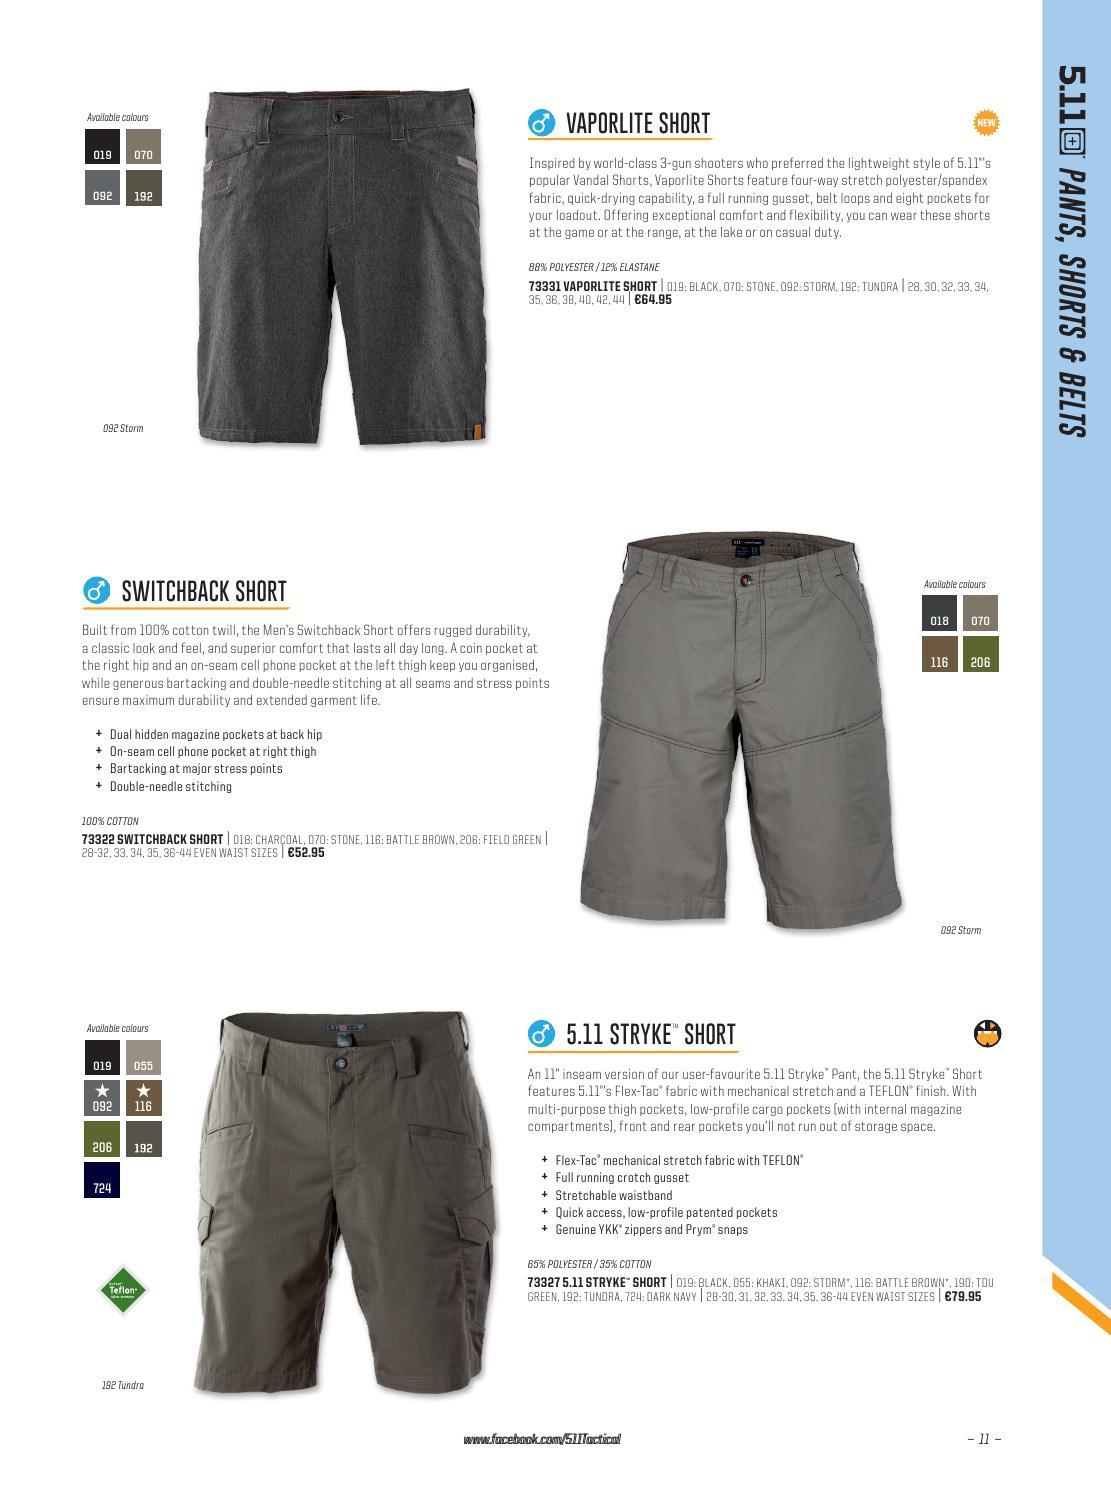 5.11 Mens Switchback Shorts